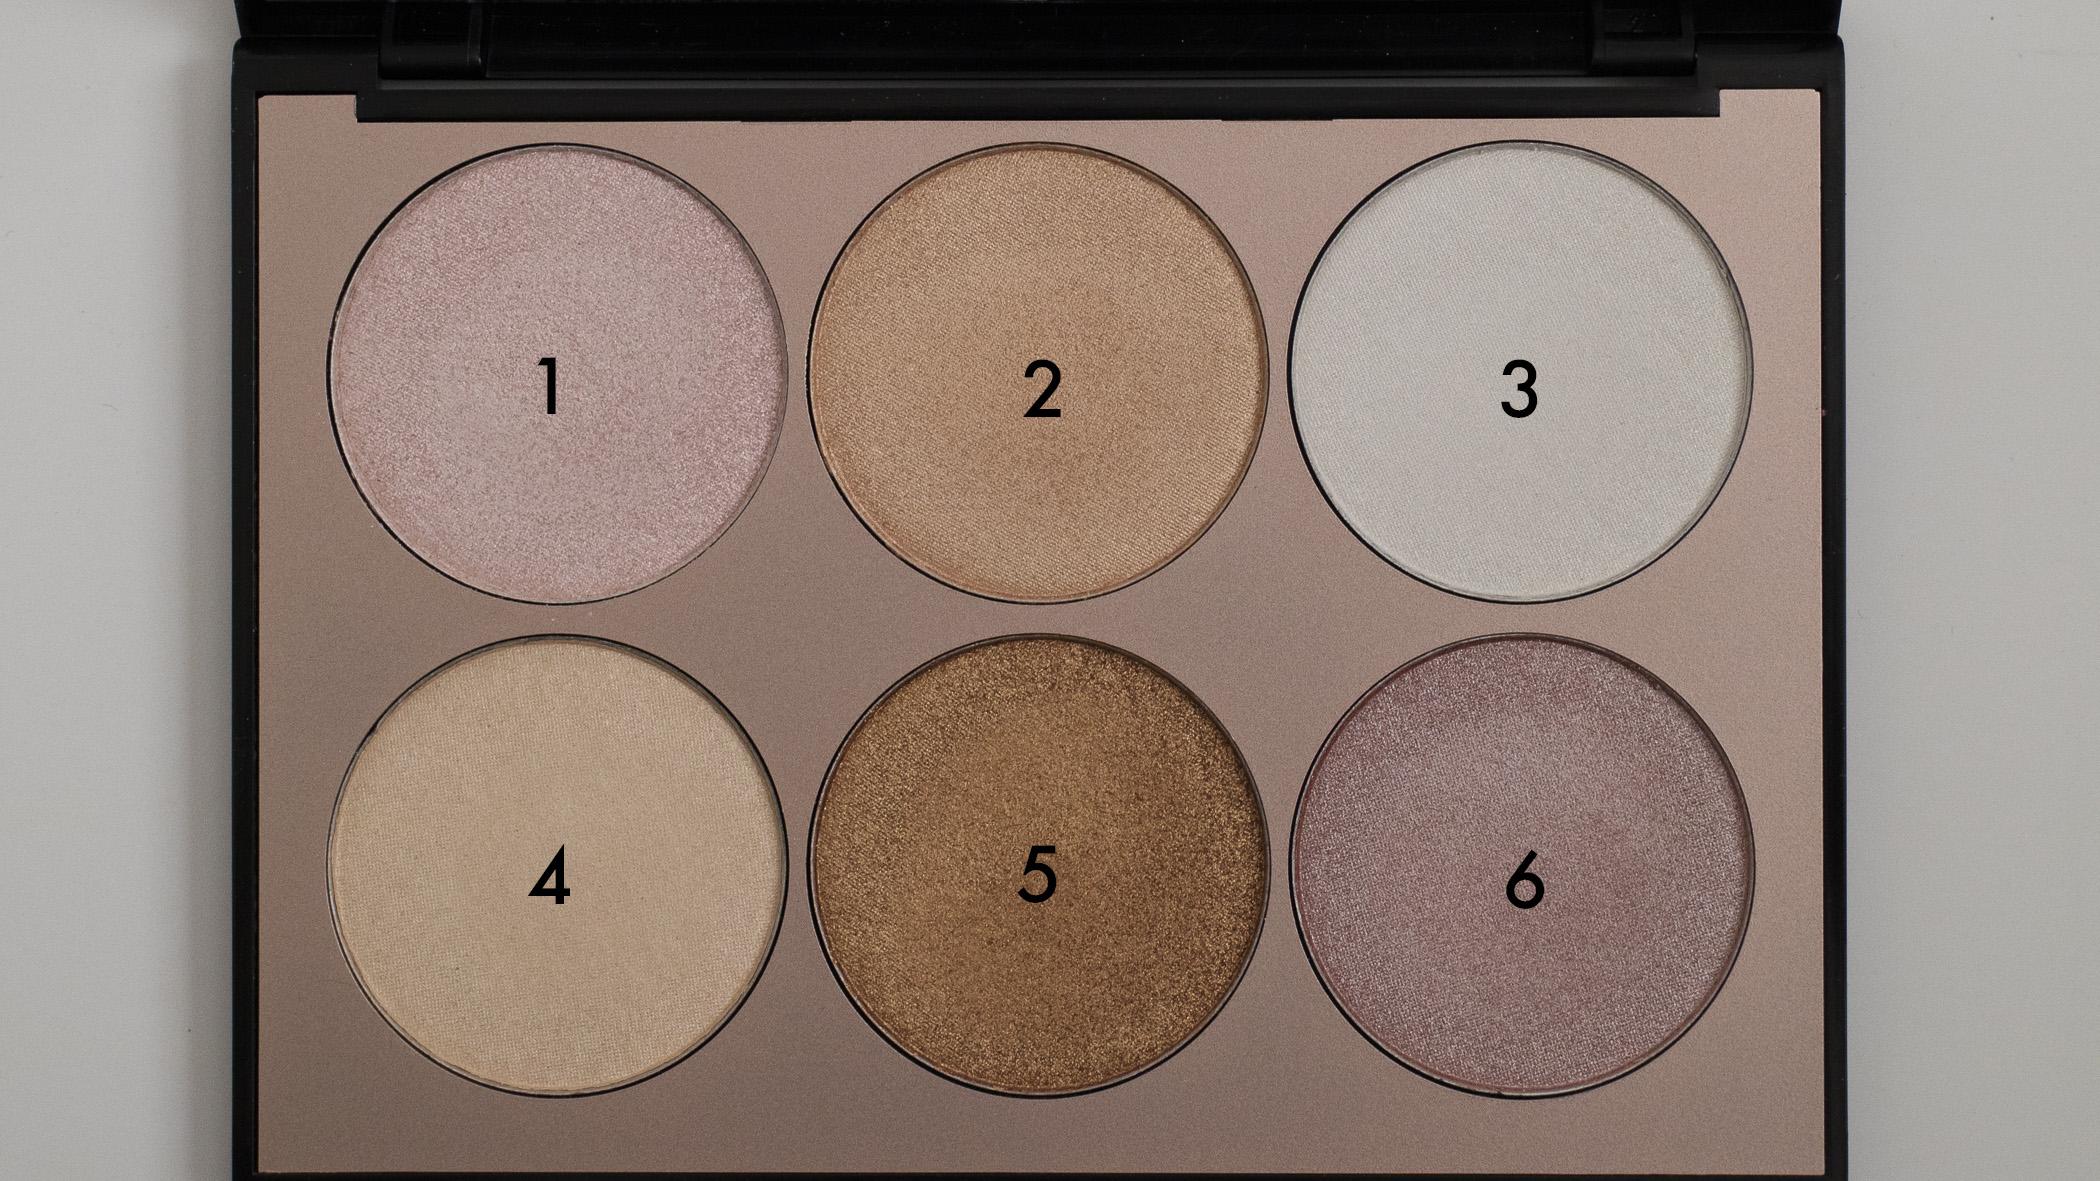 Sephora Luminizing Palette